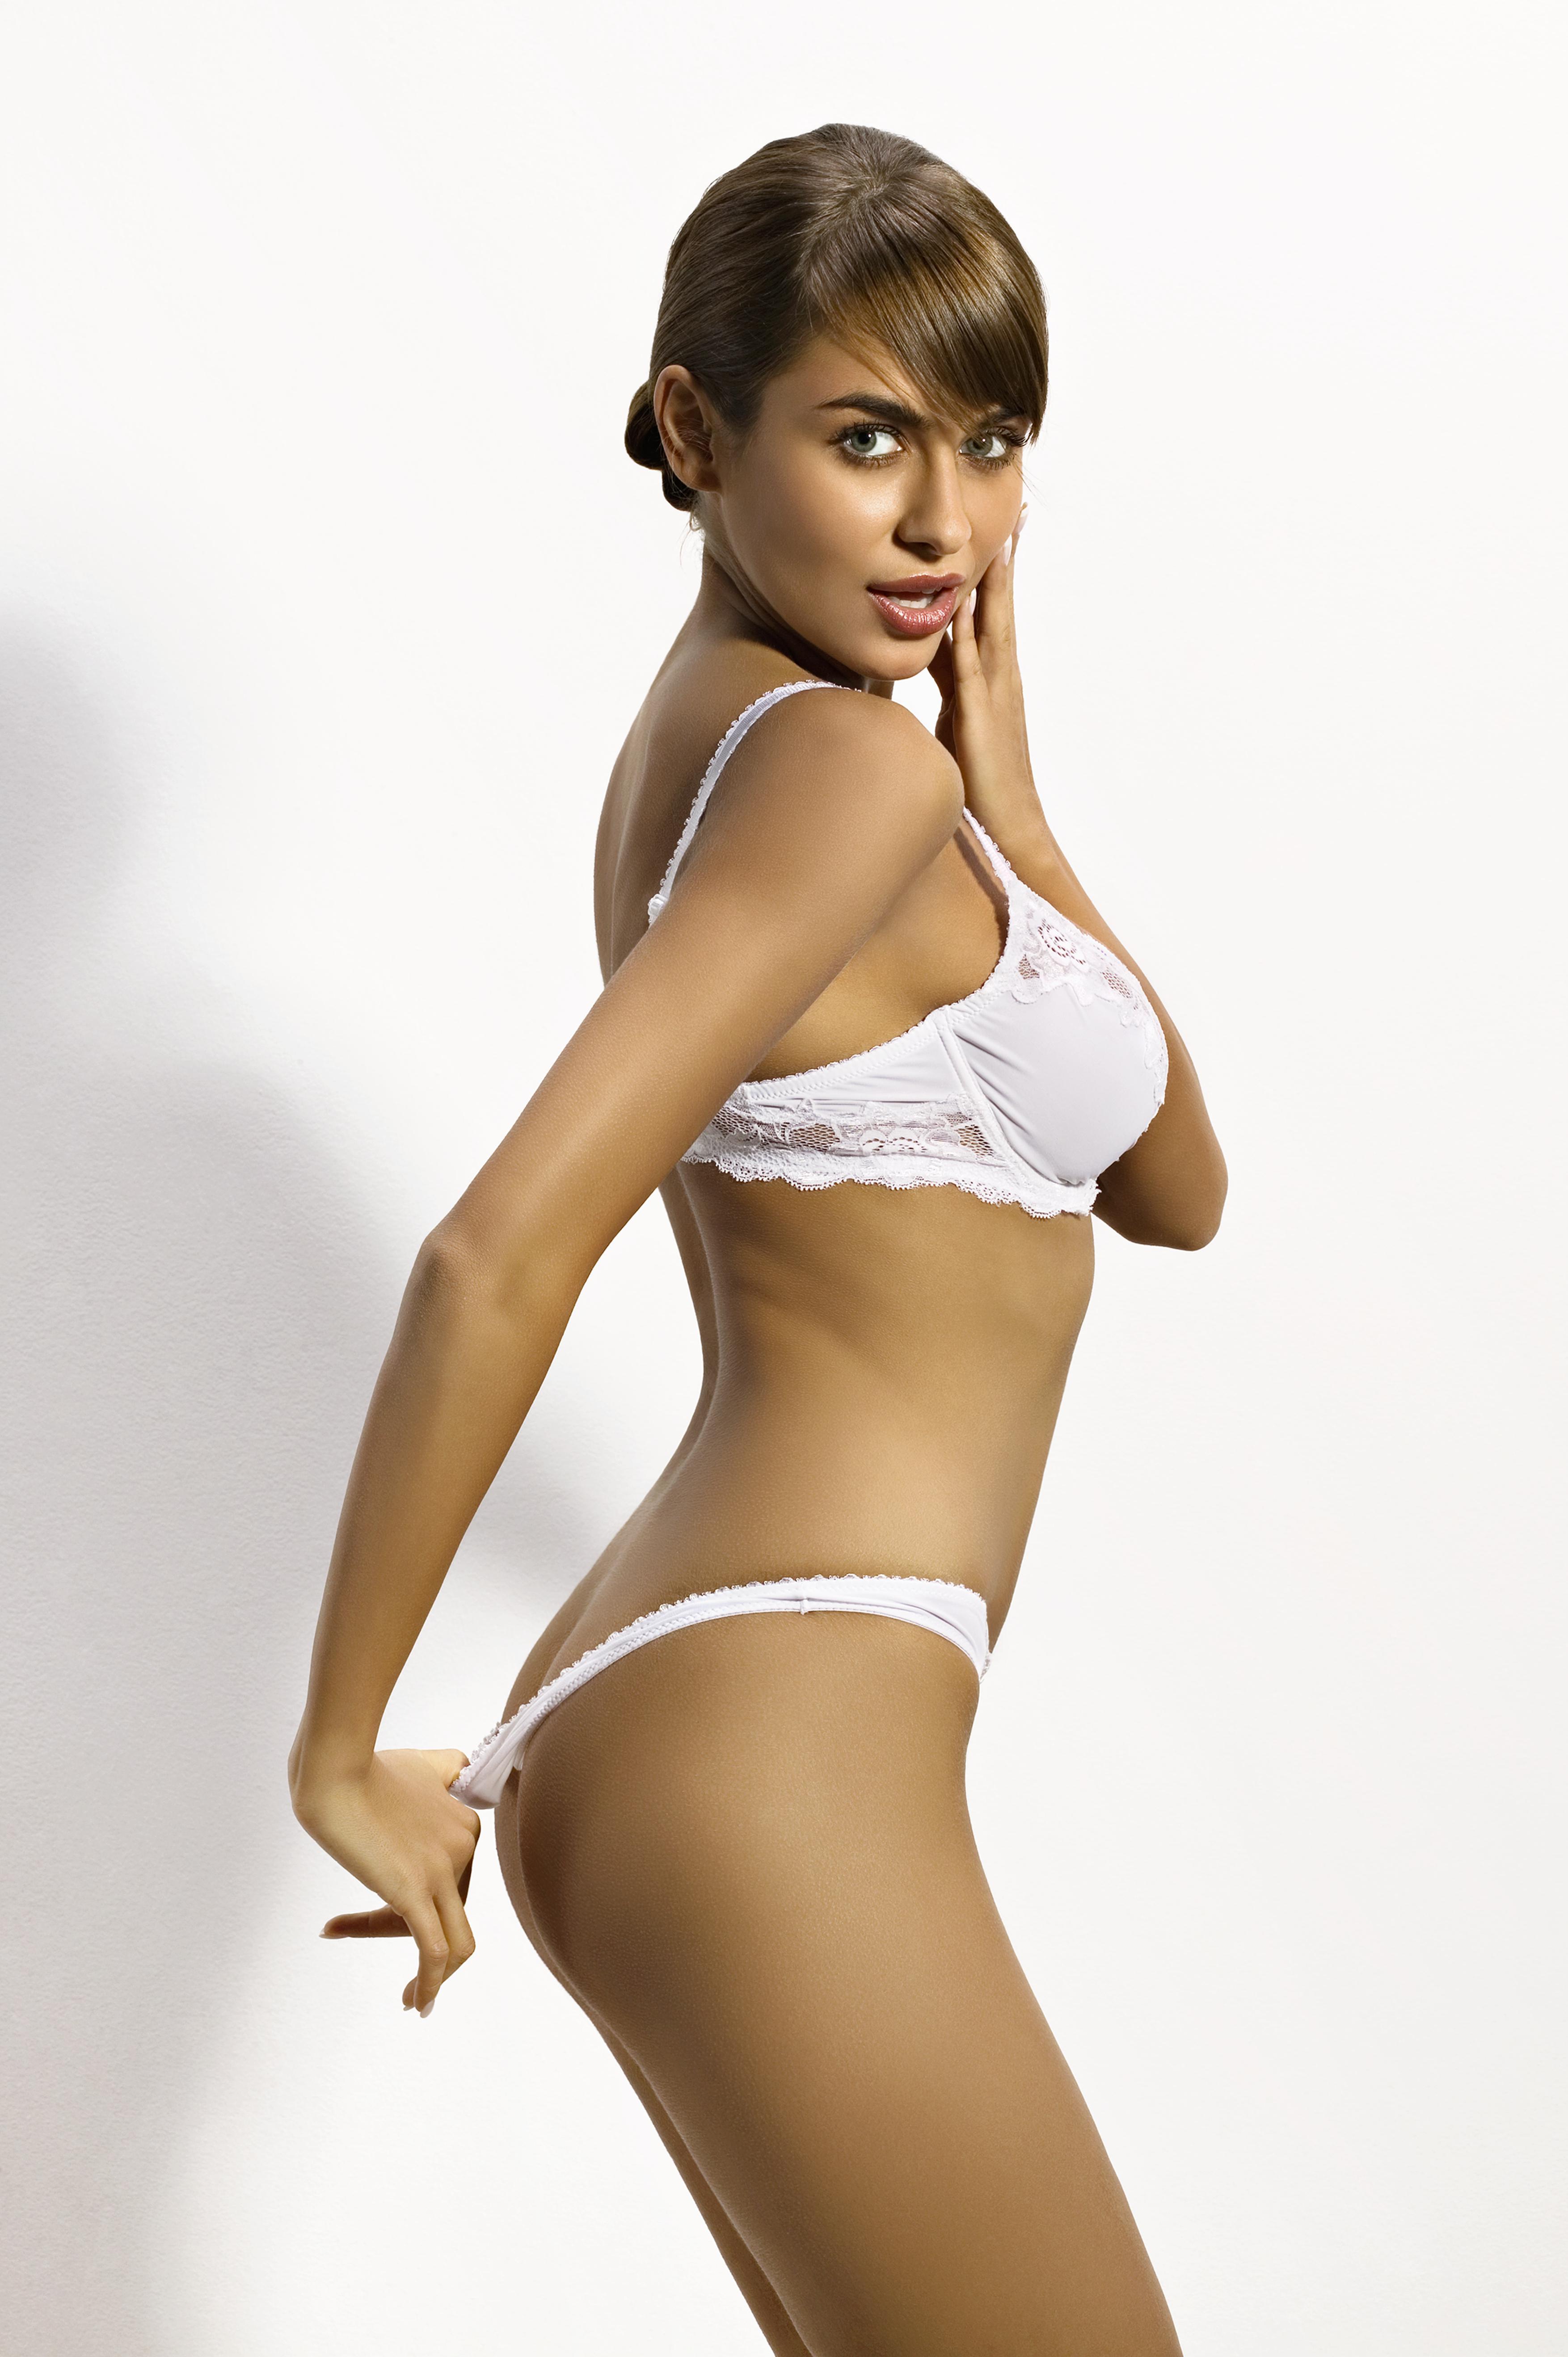 Woman wearing matching lingerie